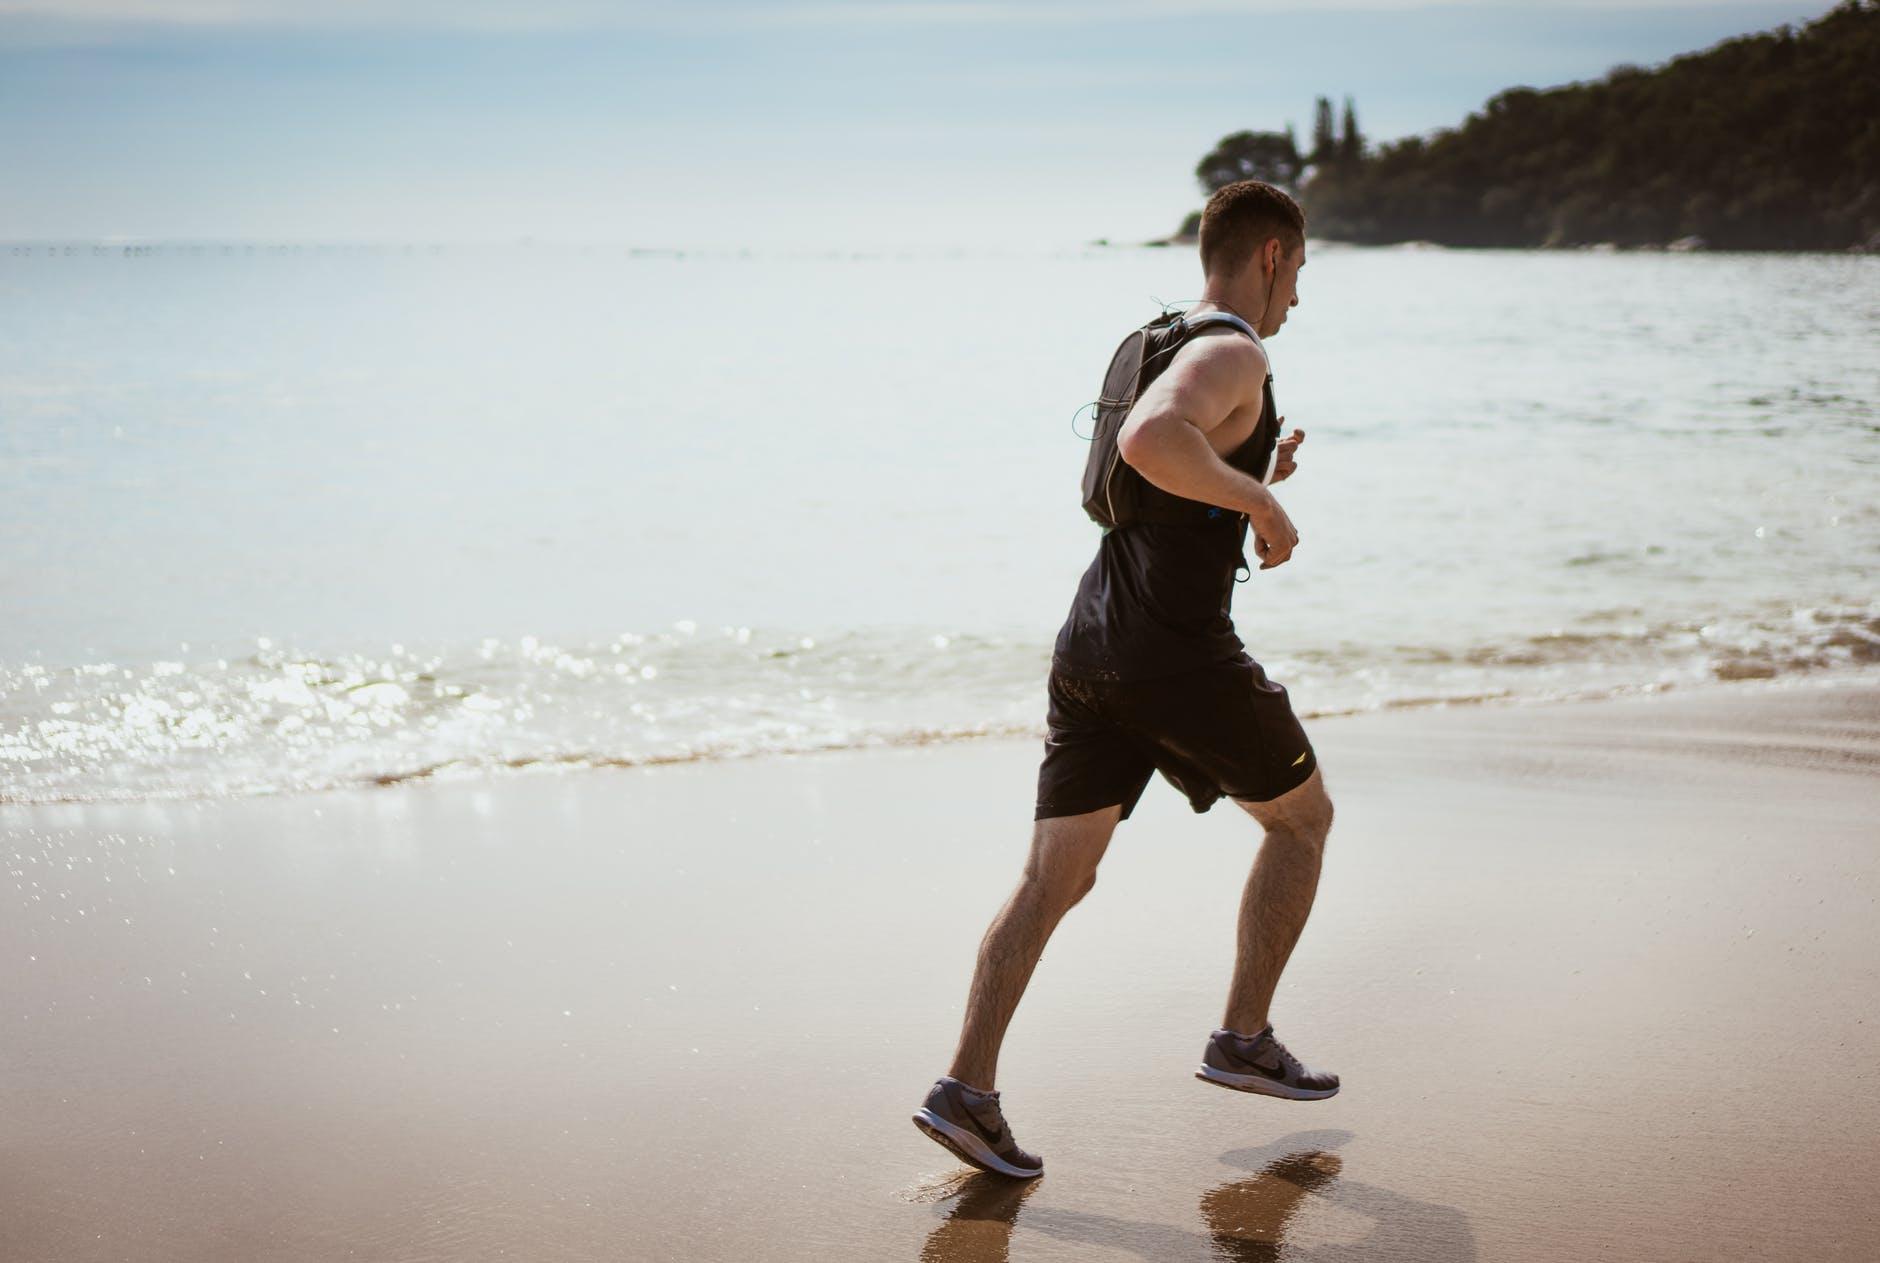 bežec na pláži